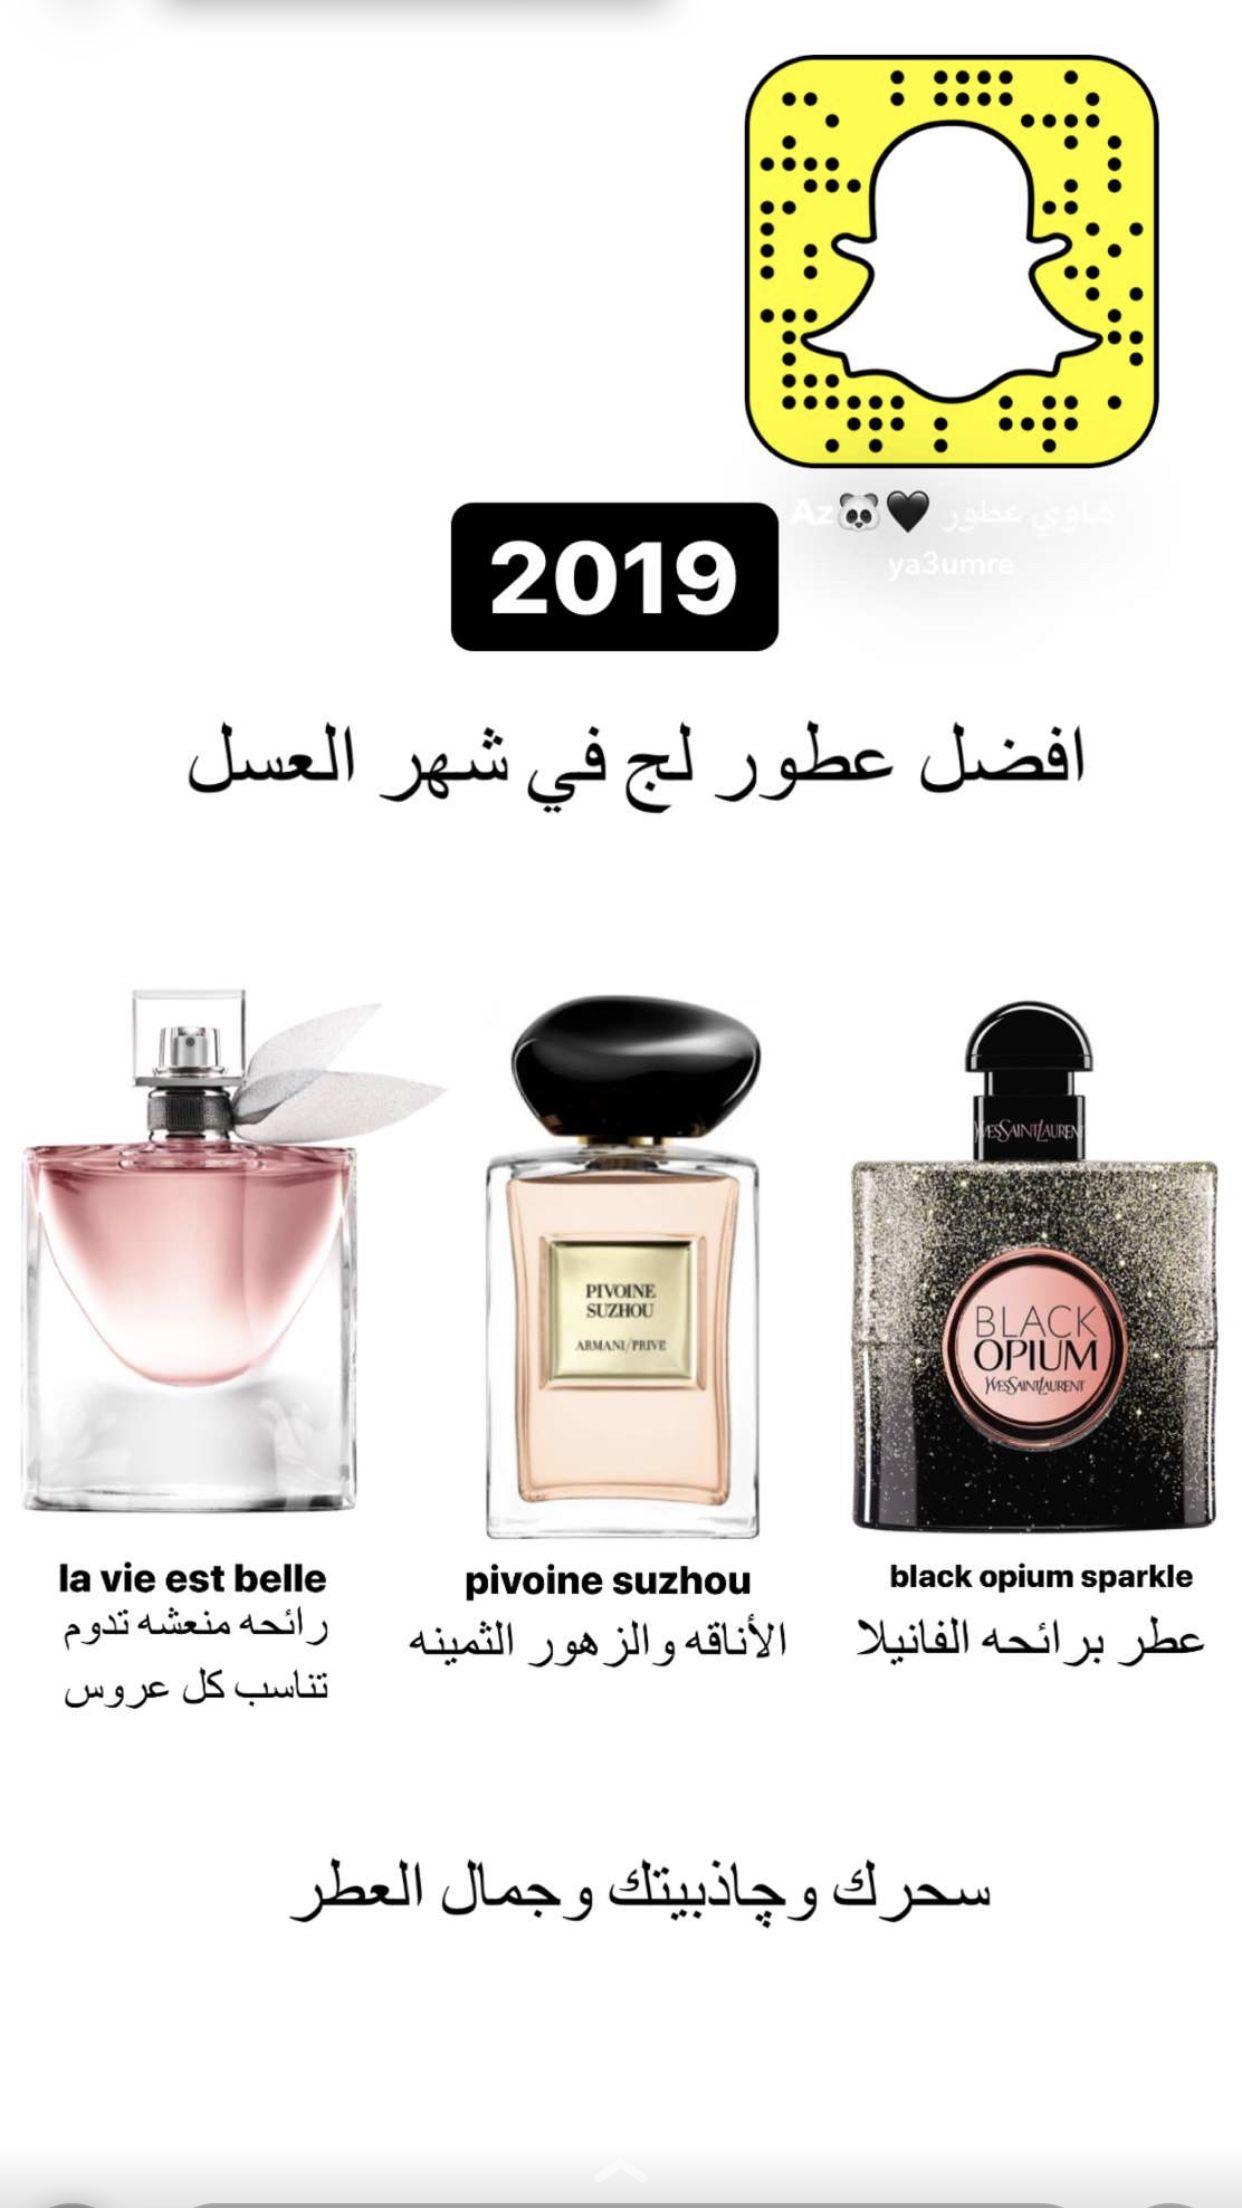 Pin By Najla Ya On عطور In 2020 Beauty Perfume Natural Skin Care Diy Perfume Lover